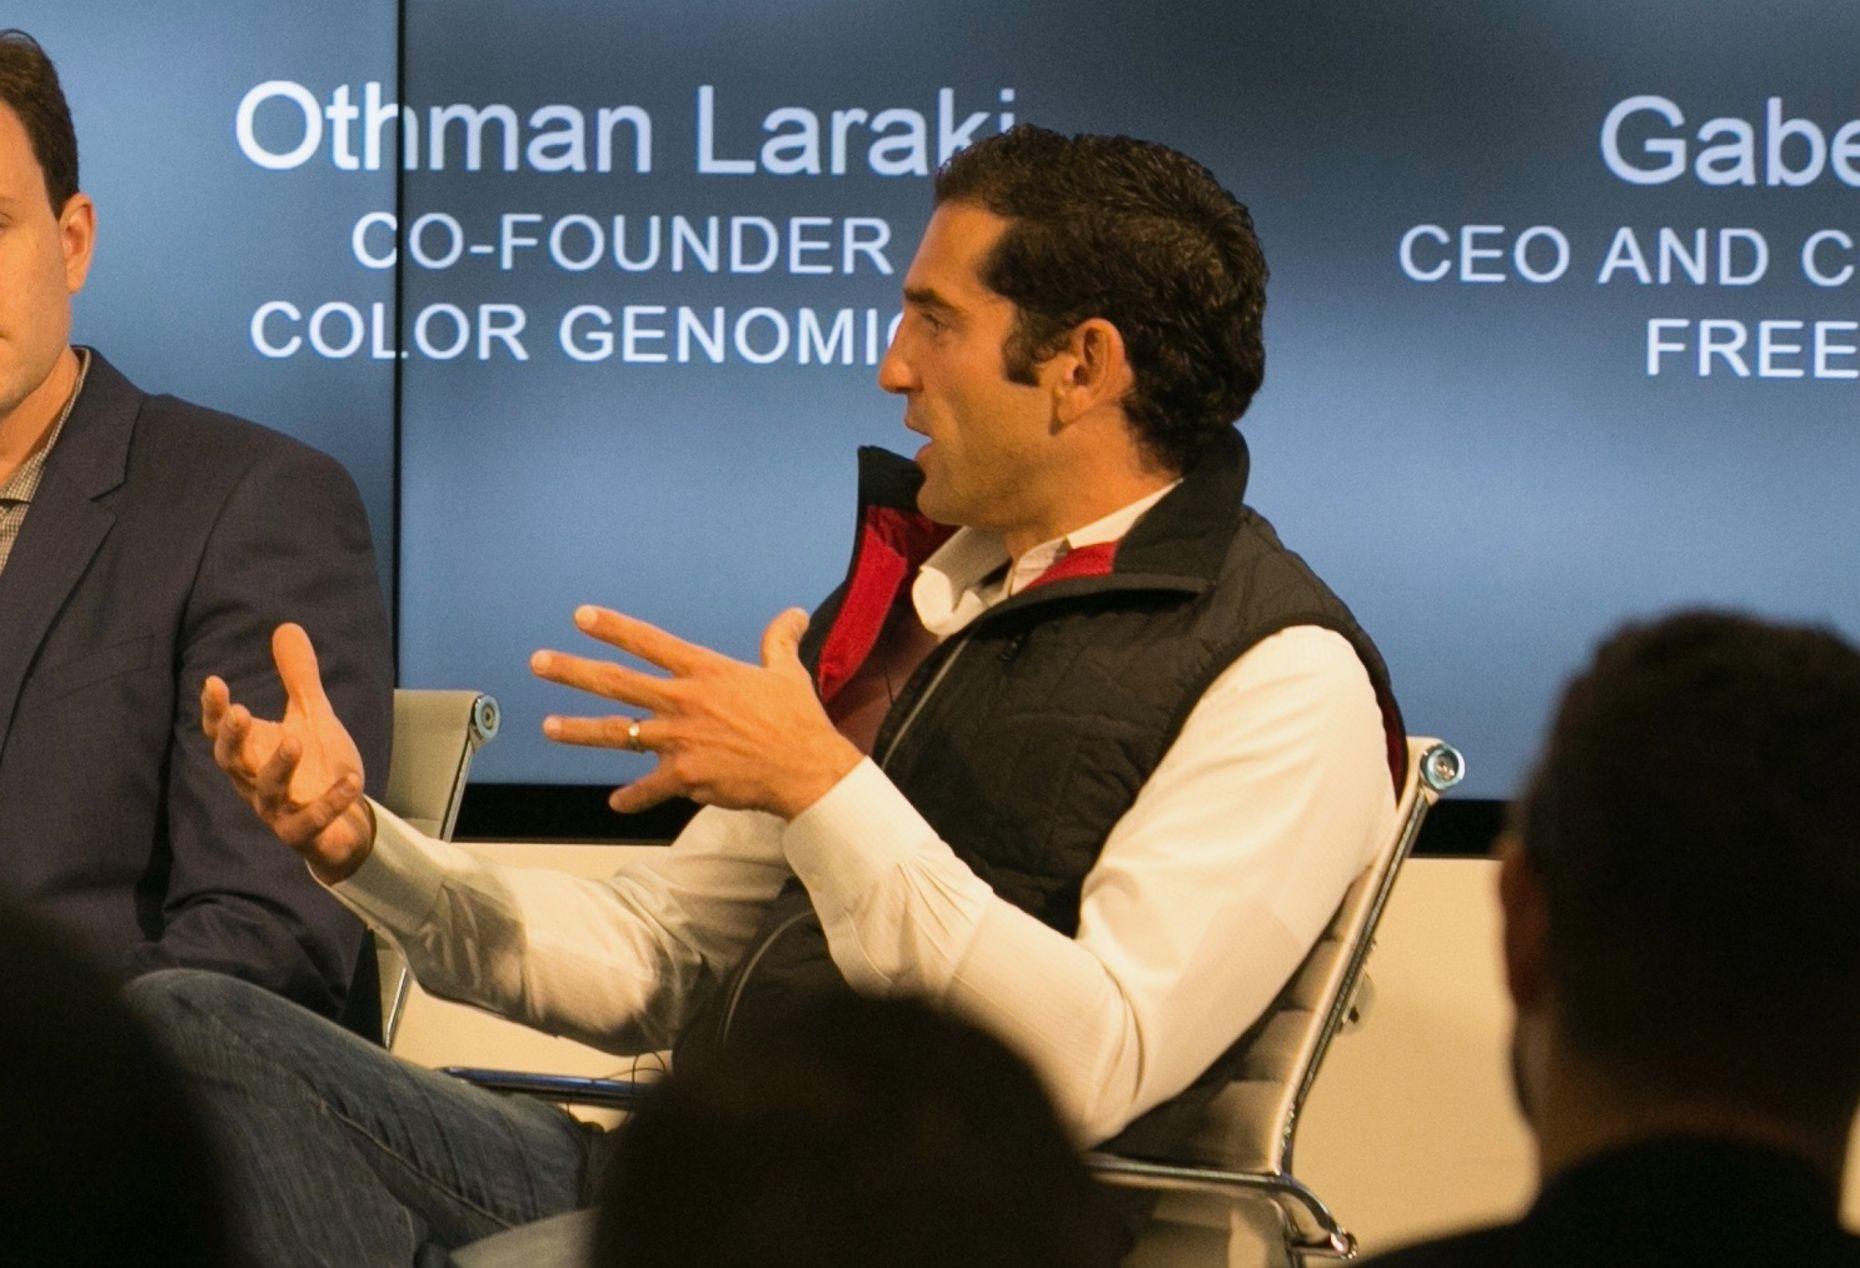 Color Genomics CEO Othman Laraki at The Information's San Francisco Subscriber Summit last October. Photo by Julie Mikos.